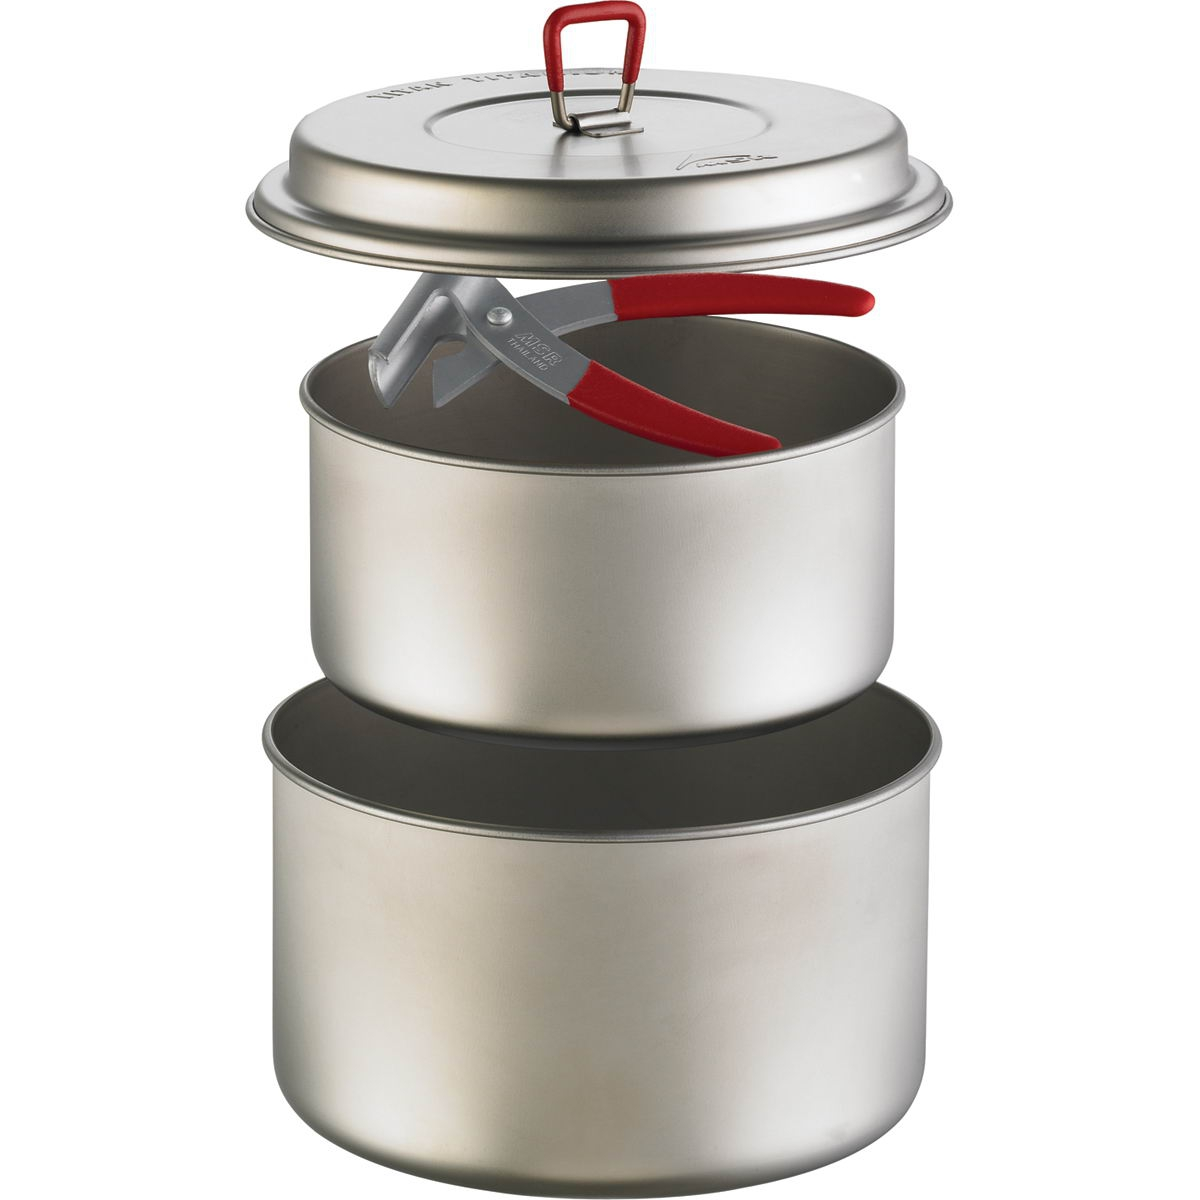 MSR - Titan 2 Pot Set  - Pots & Pans -